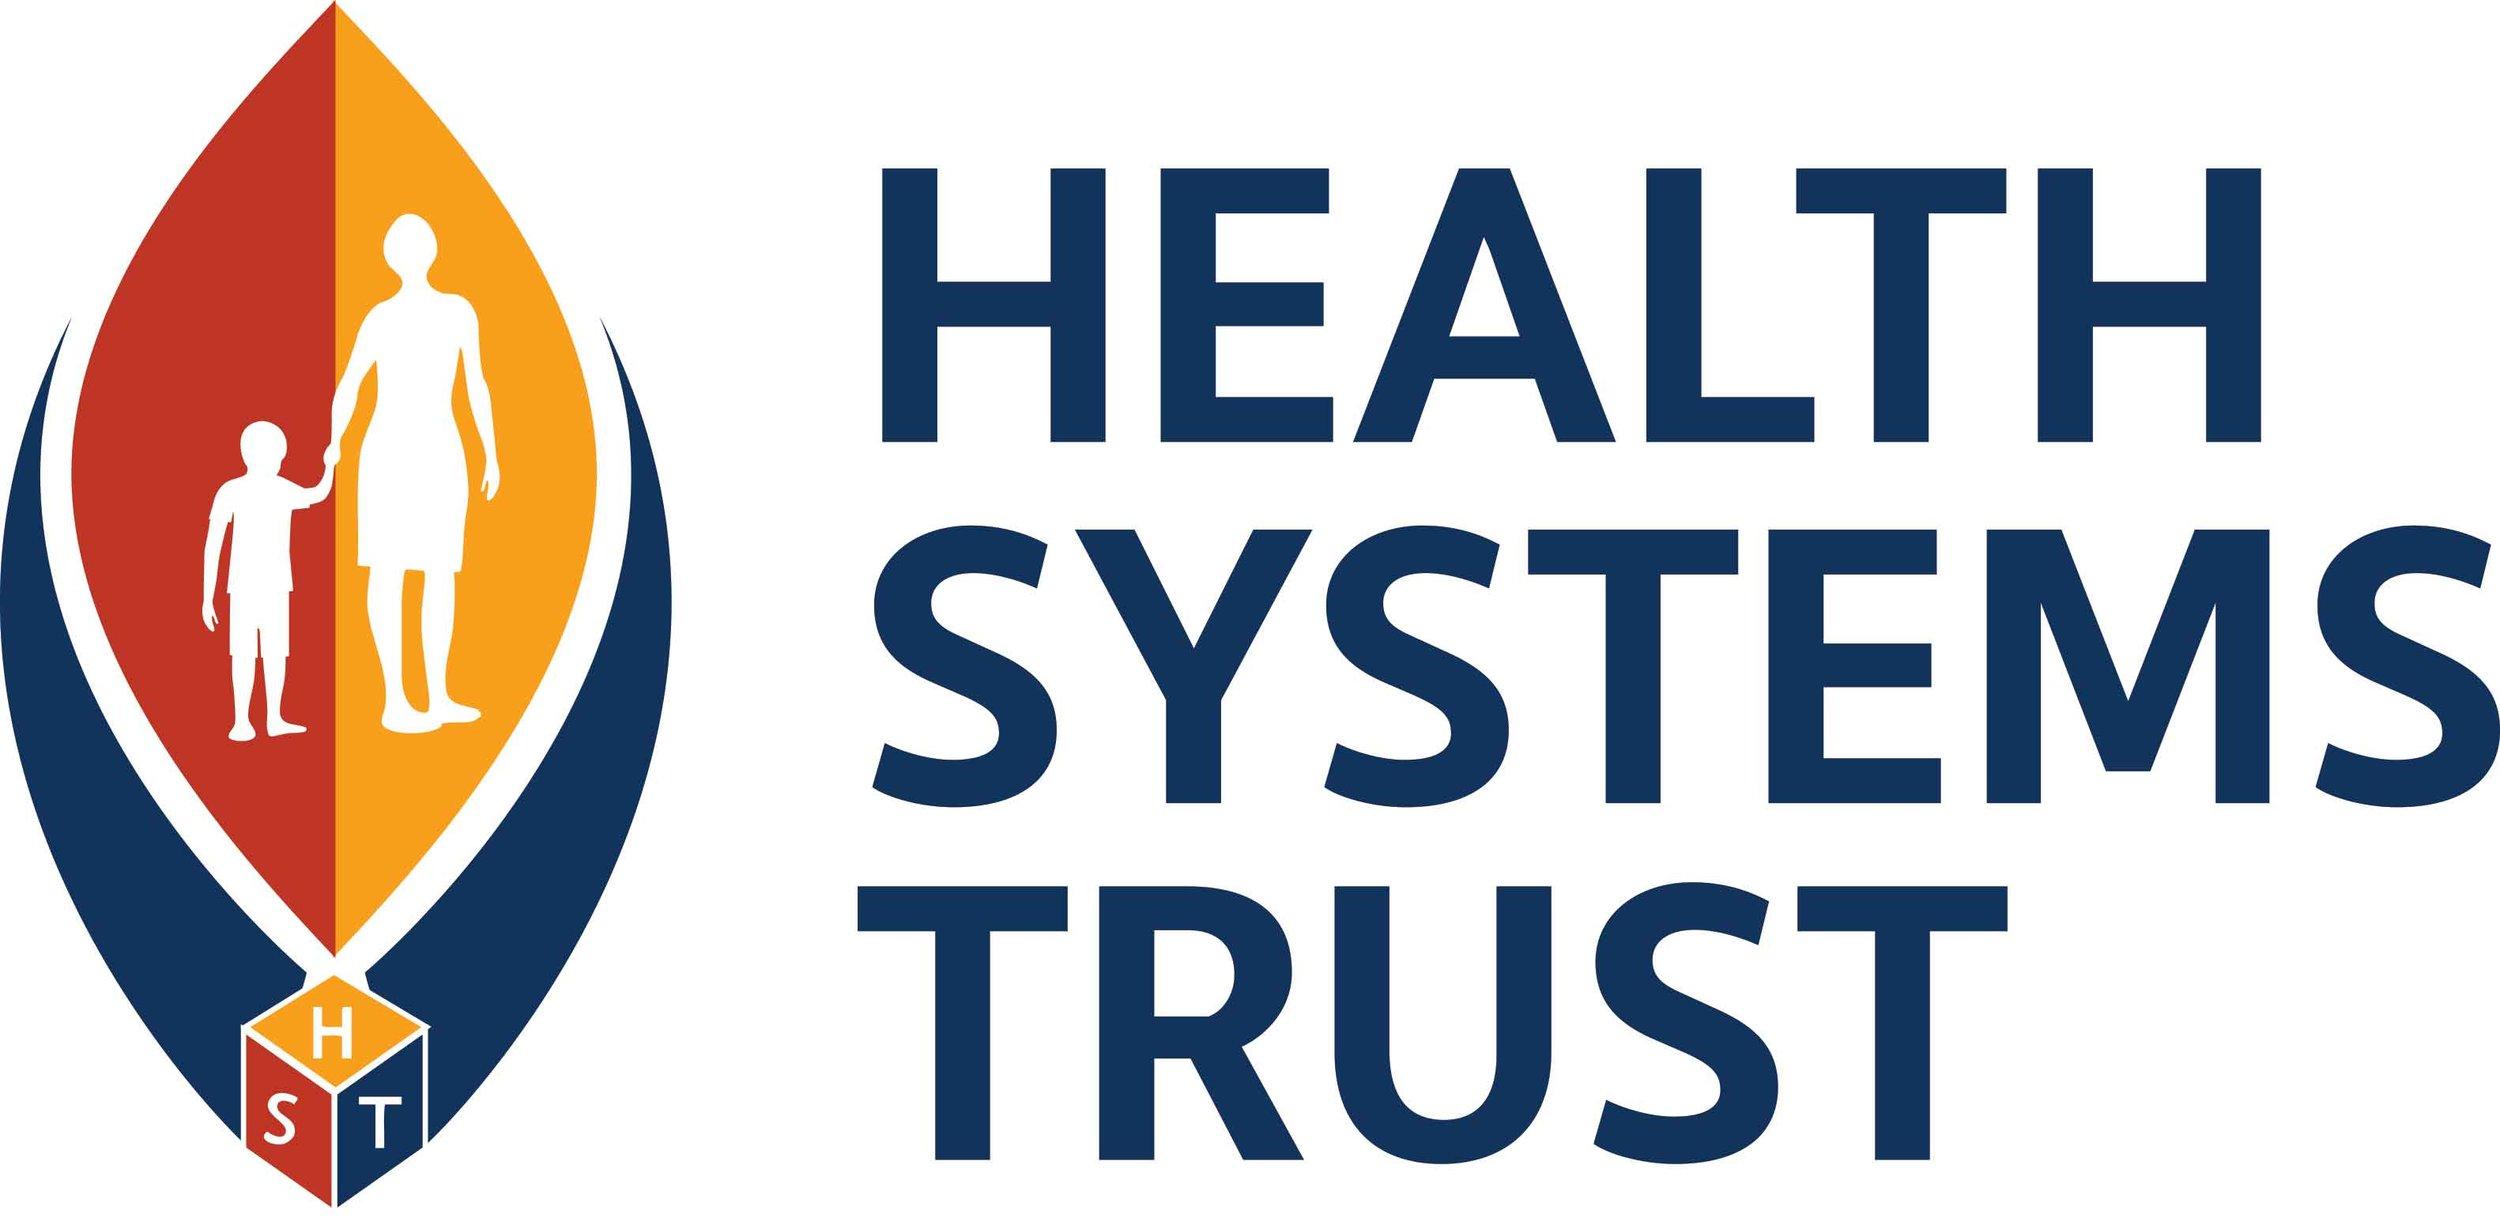 HST-Logo_LR.jpg